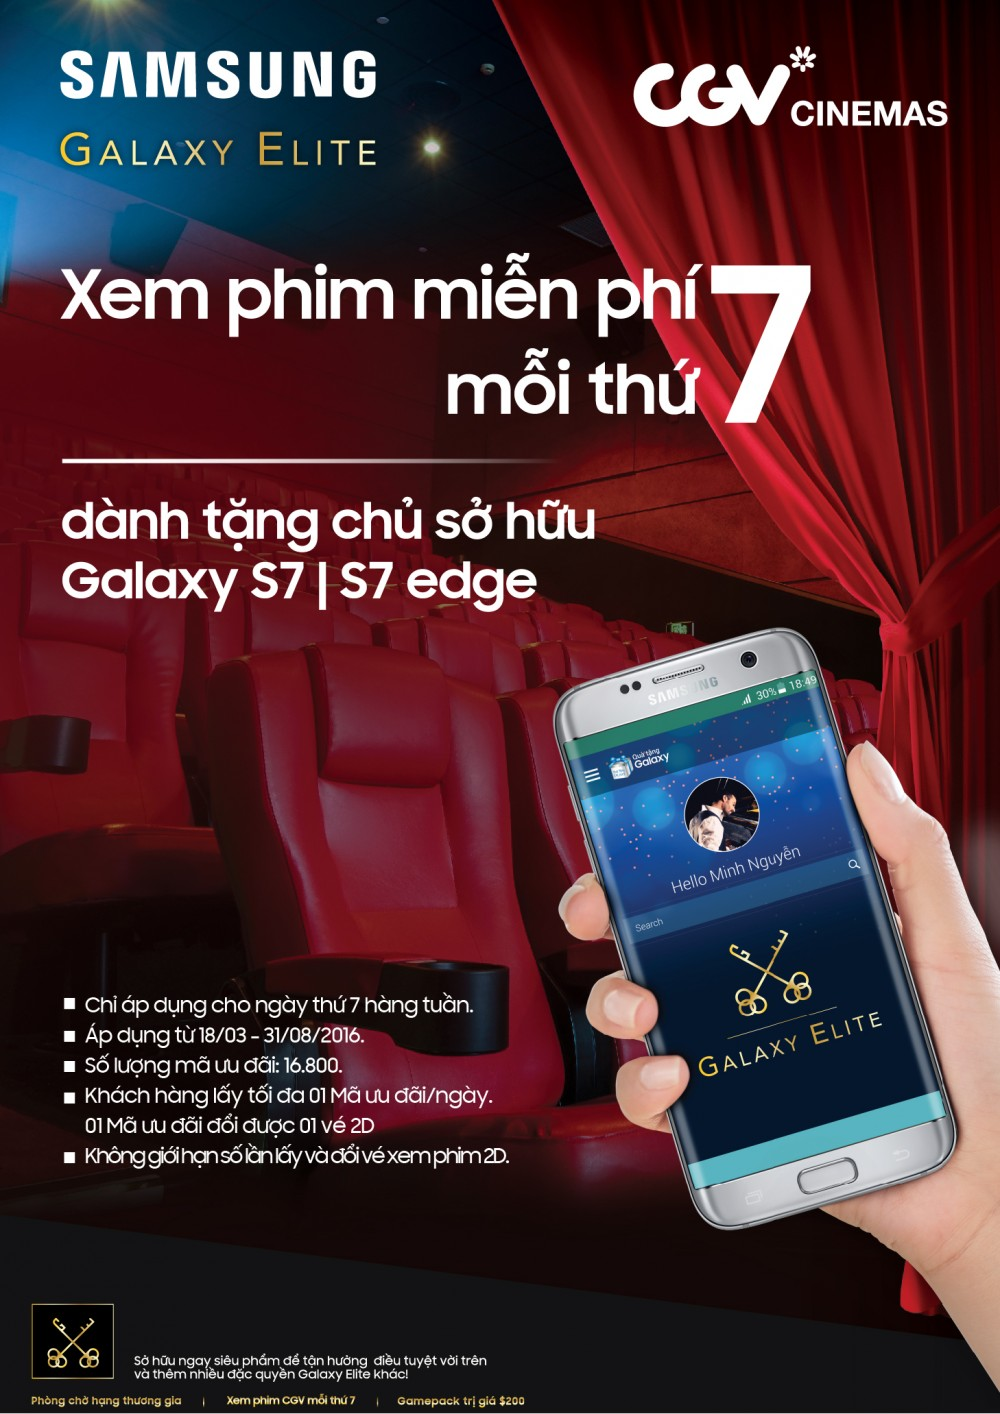 Quà Tặng Từ Samsung Galaxy S7